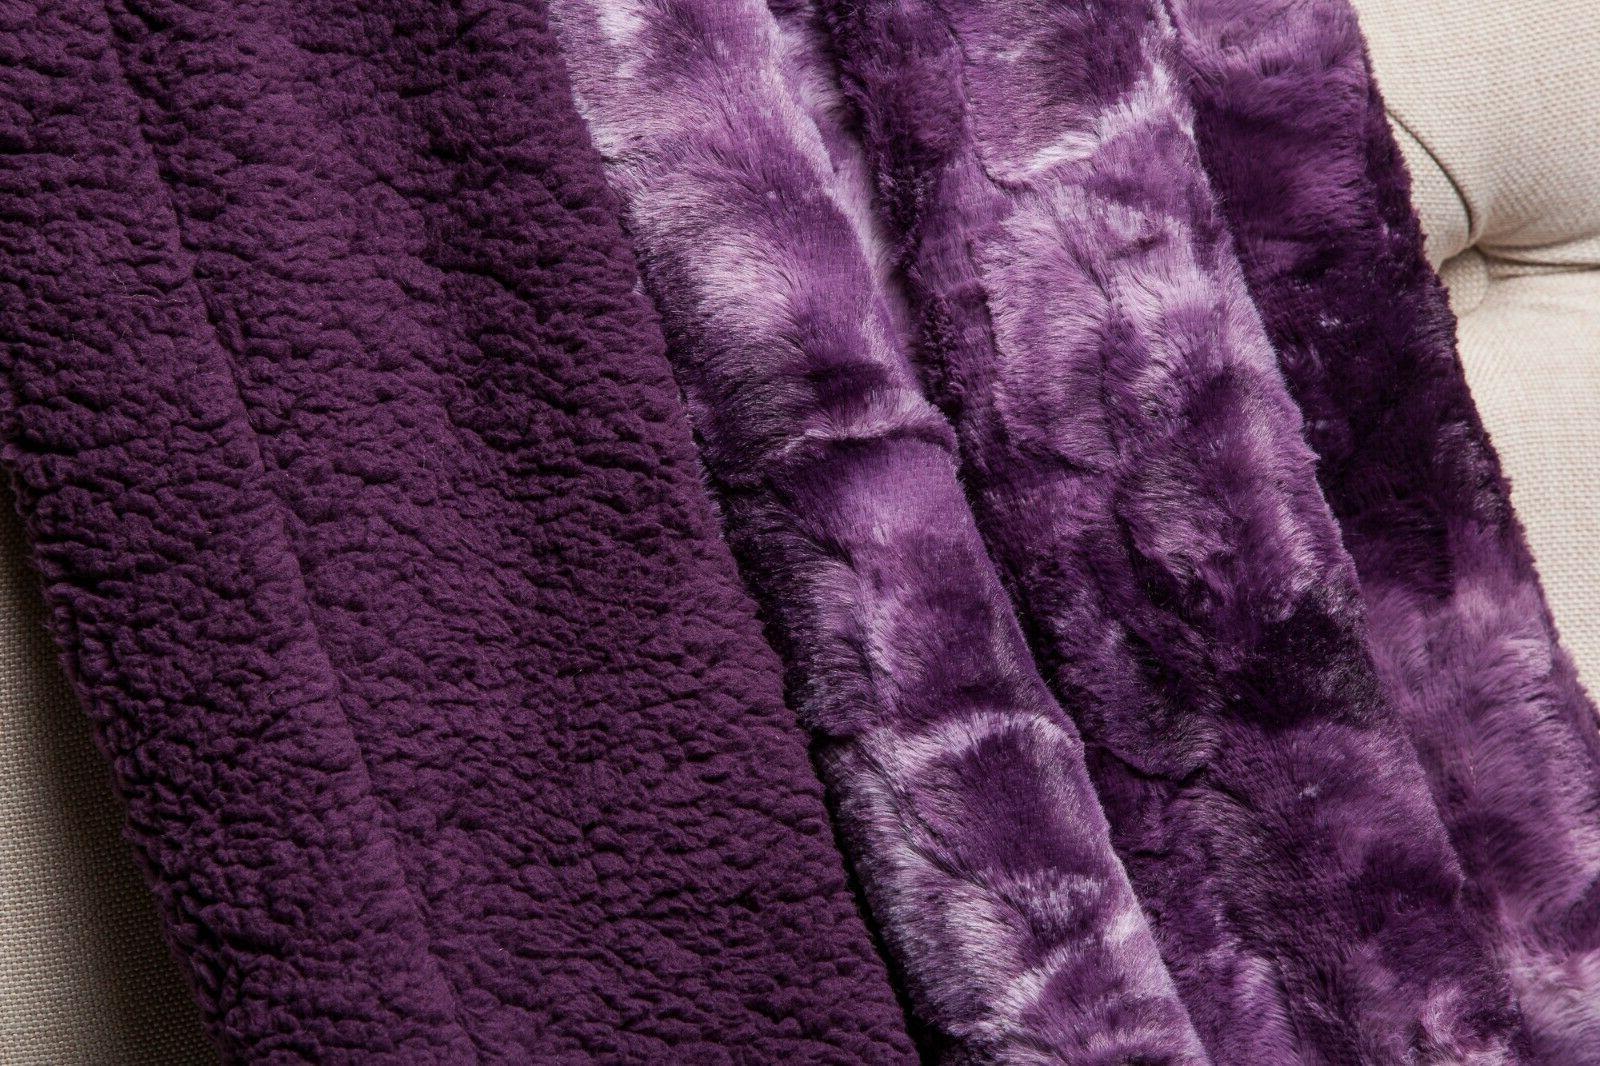 Chanasya 3-Piece Soft Faux Cozy Covers